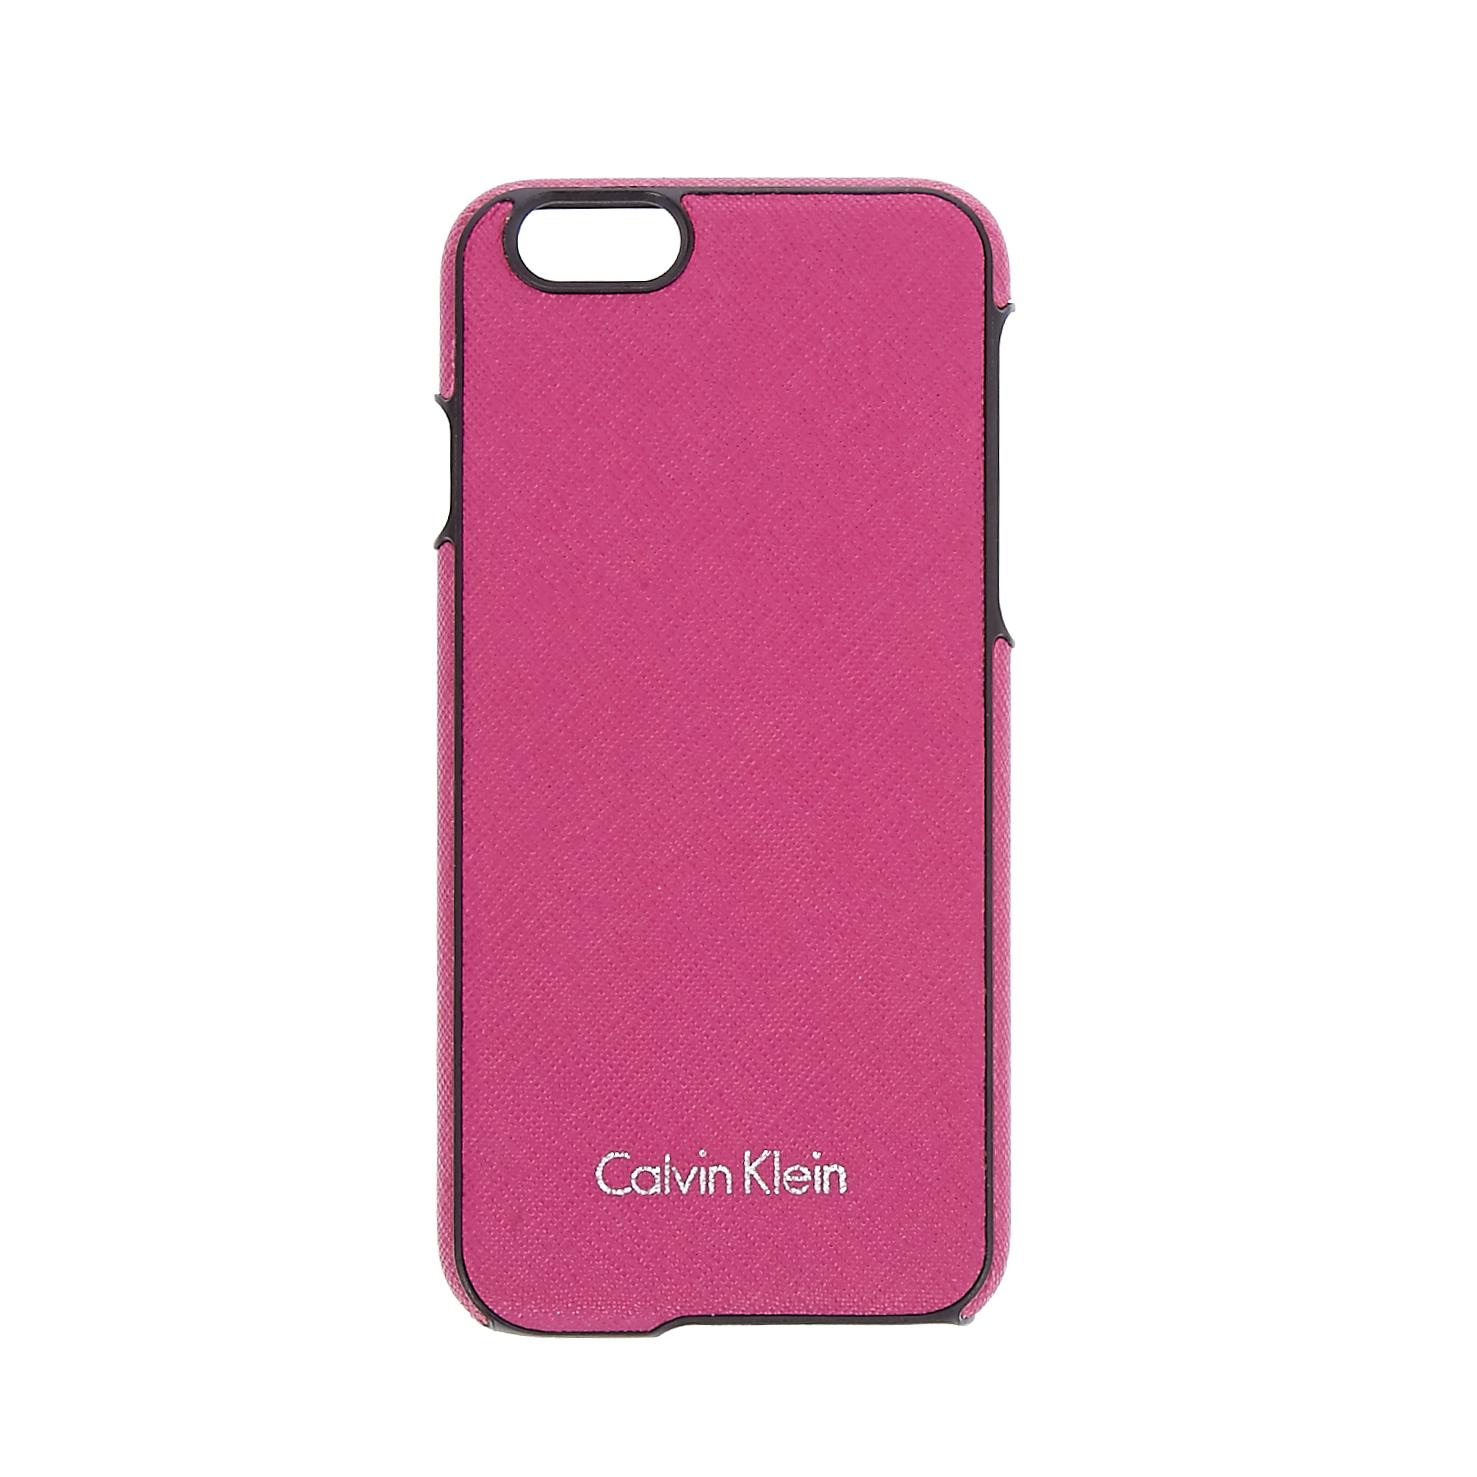 CALVIN KLEIN JEANS - Θήκη iphone 6 Calvin Klein Jeans φούξια γυναικεία αξεσουάρ θήκες